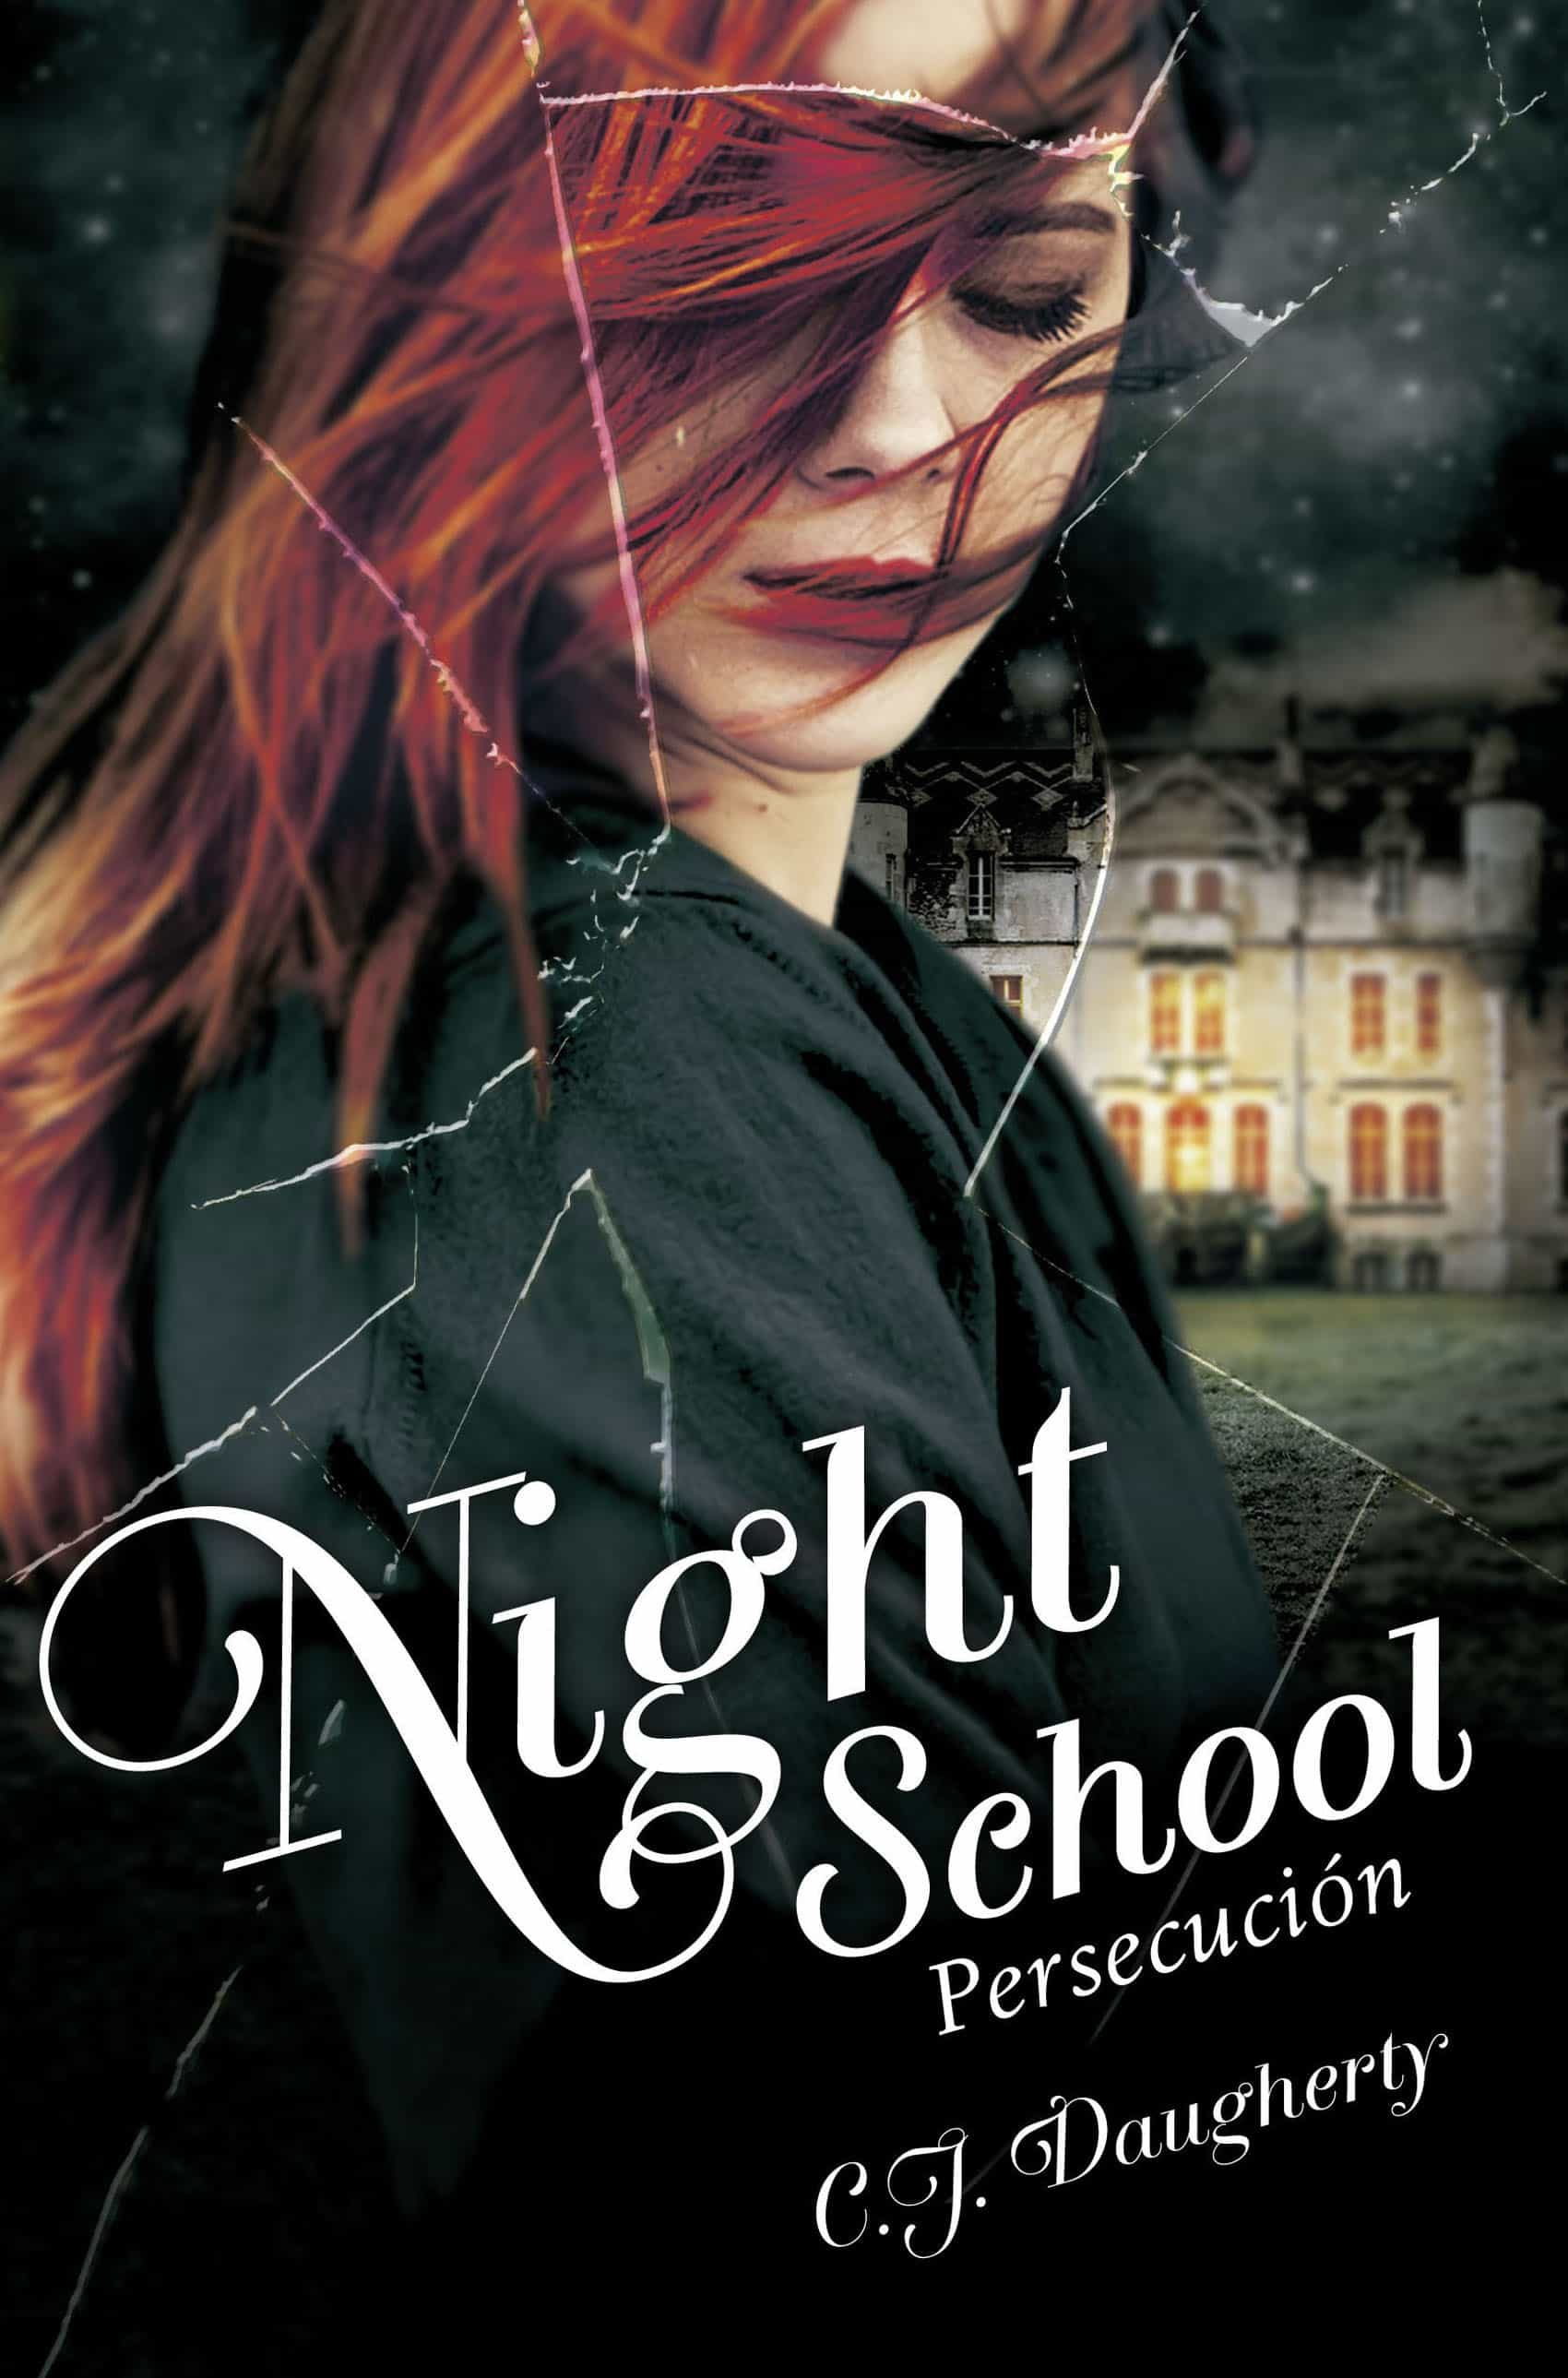 Persecuci�n (night School 3) (ebook)cj Daugherty9788420417141